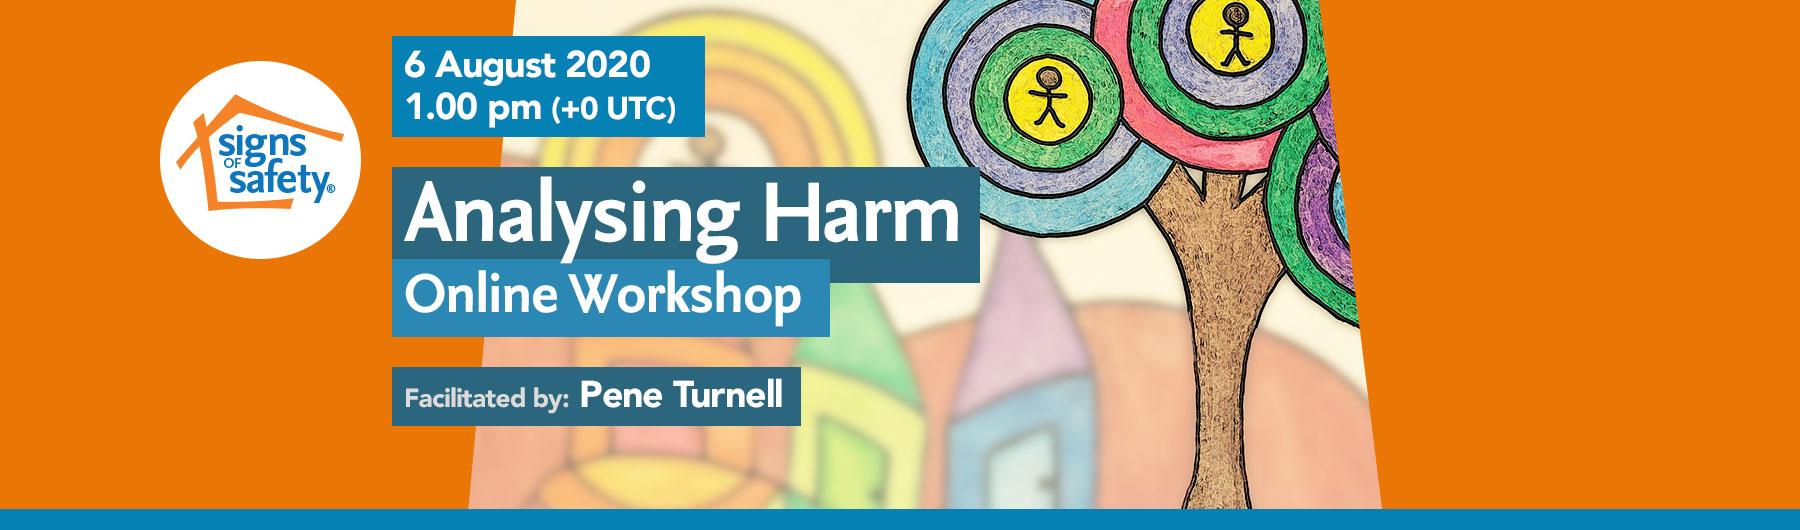 Analysing Harm Online Practice Workshop